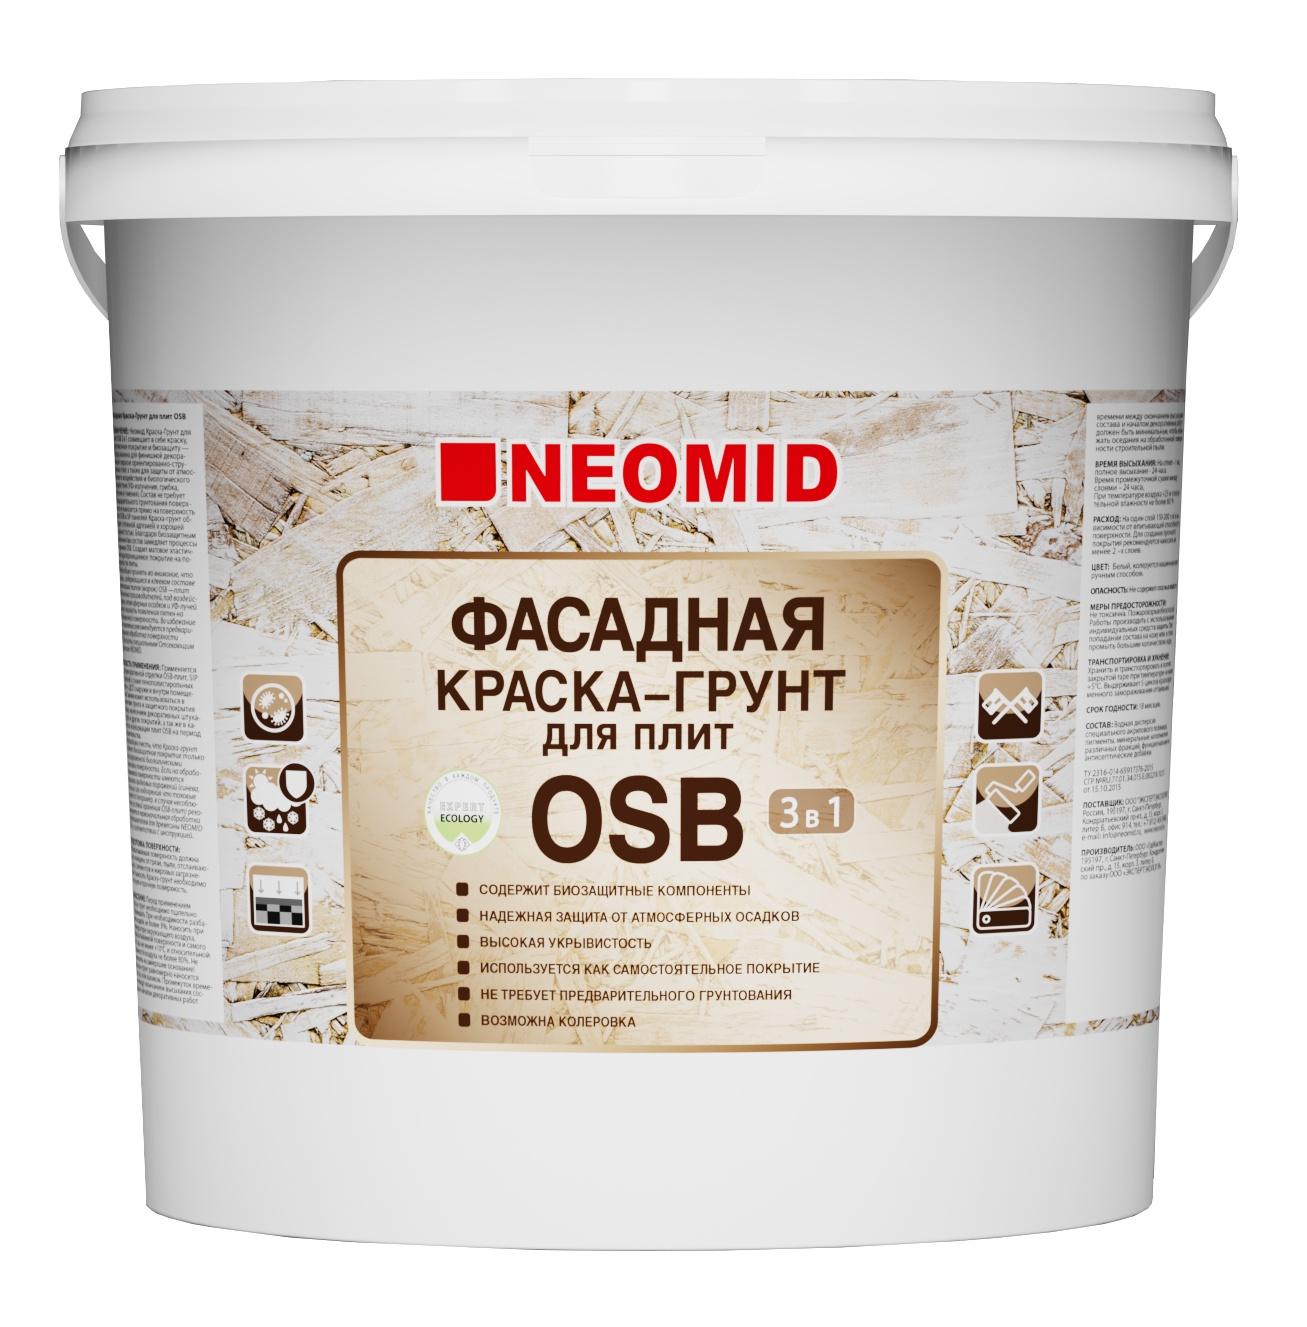 Фото - Краска neomid грунт для плит OSB Proff 3 в 1, фасадная, 7 кг грунтовка soppka osb primer для osb осп 5 кг